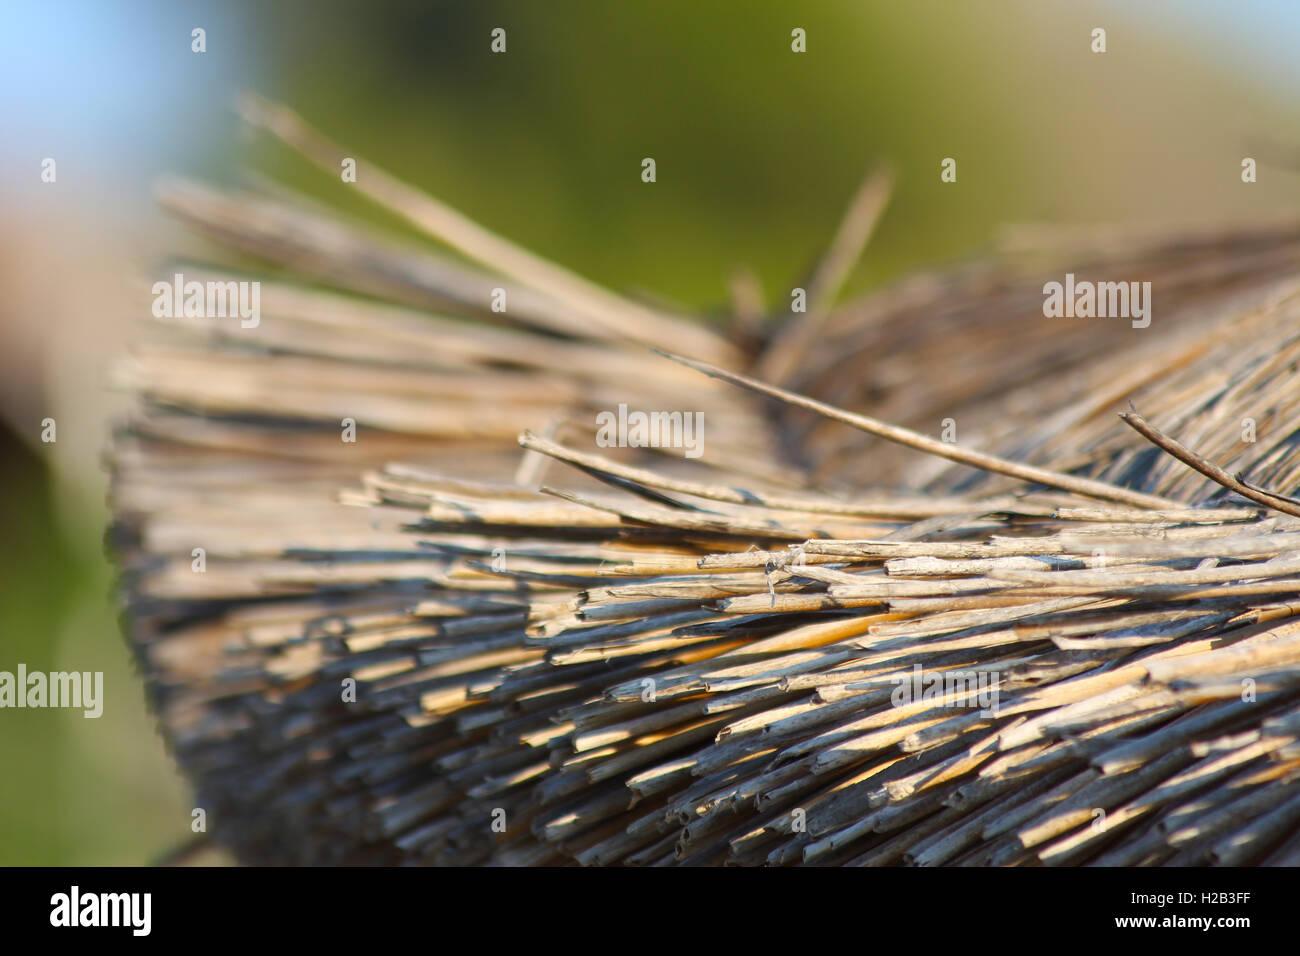 straw umbrella closeup close up - Stock Image